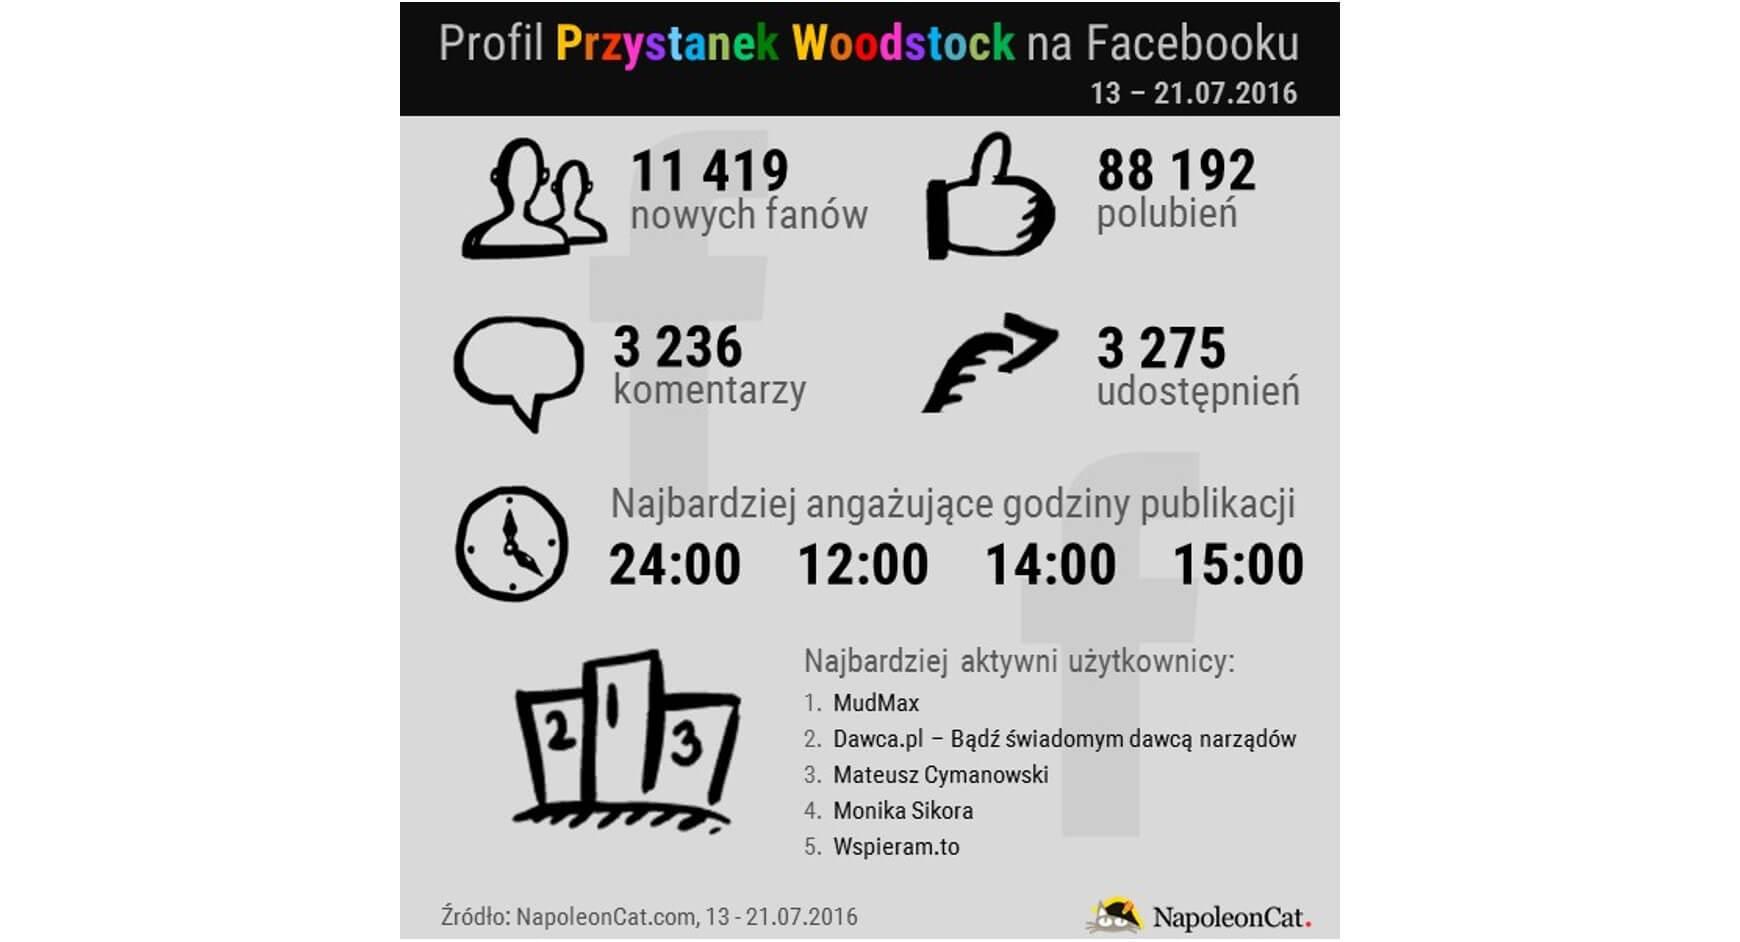 Profil Przystanek Woodstock na Facebooku_13-21.07.2016_NapoleonCat.com blog